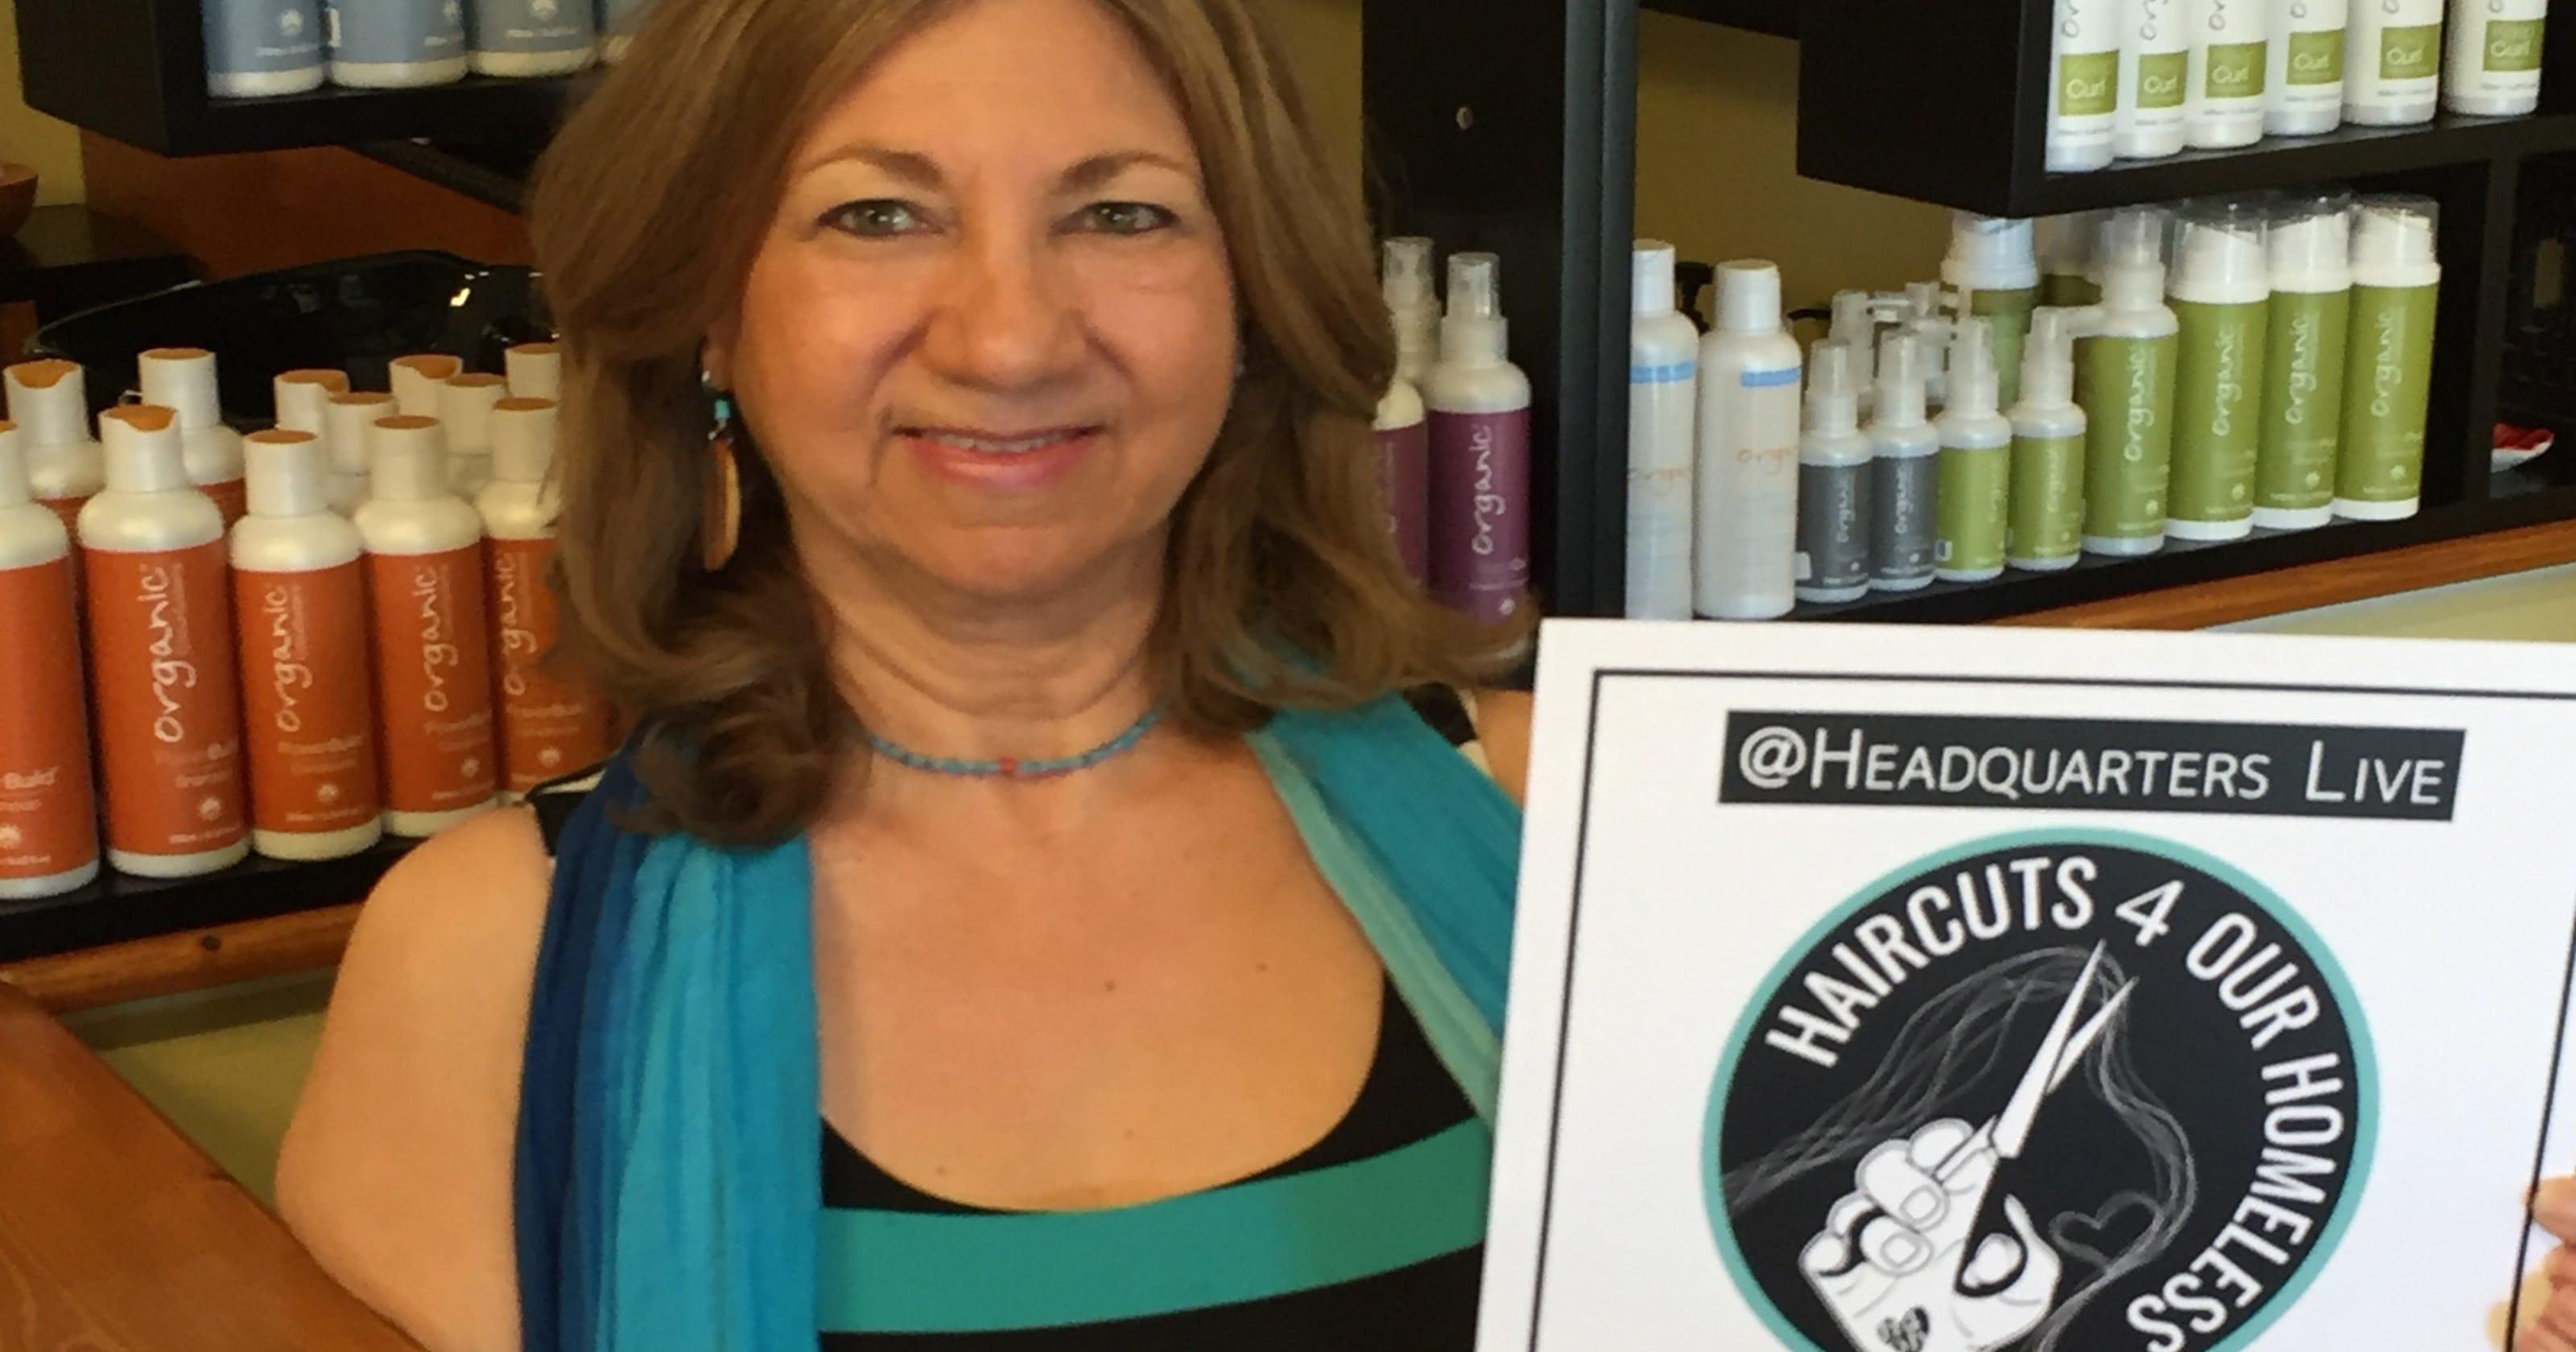 Haircuts For Homeless Lift Spirits In Salisbury